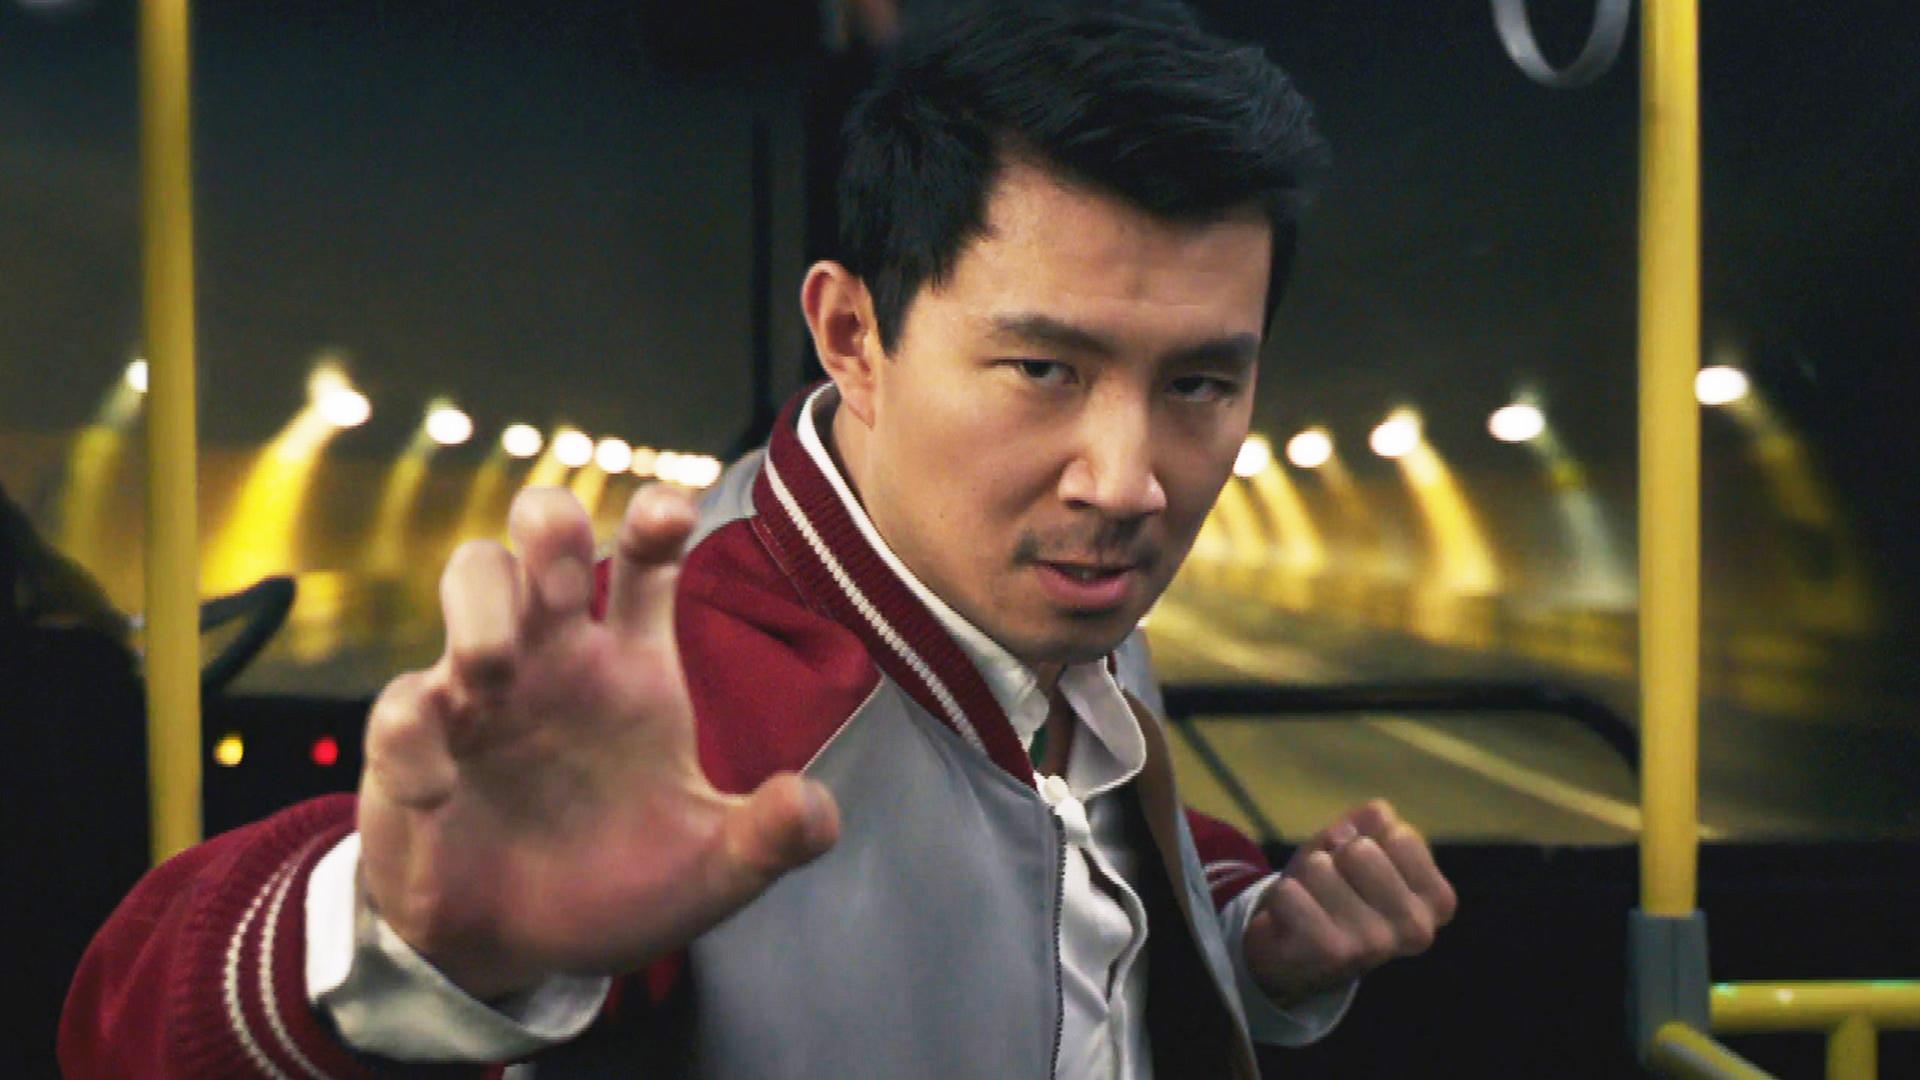 Simu Liu Made Money as Spider-Man at children's birthday parties